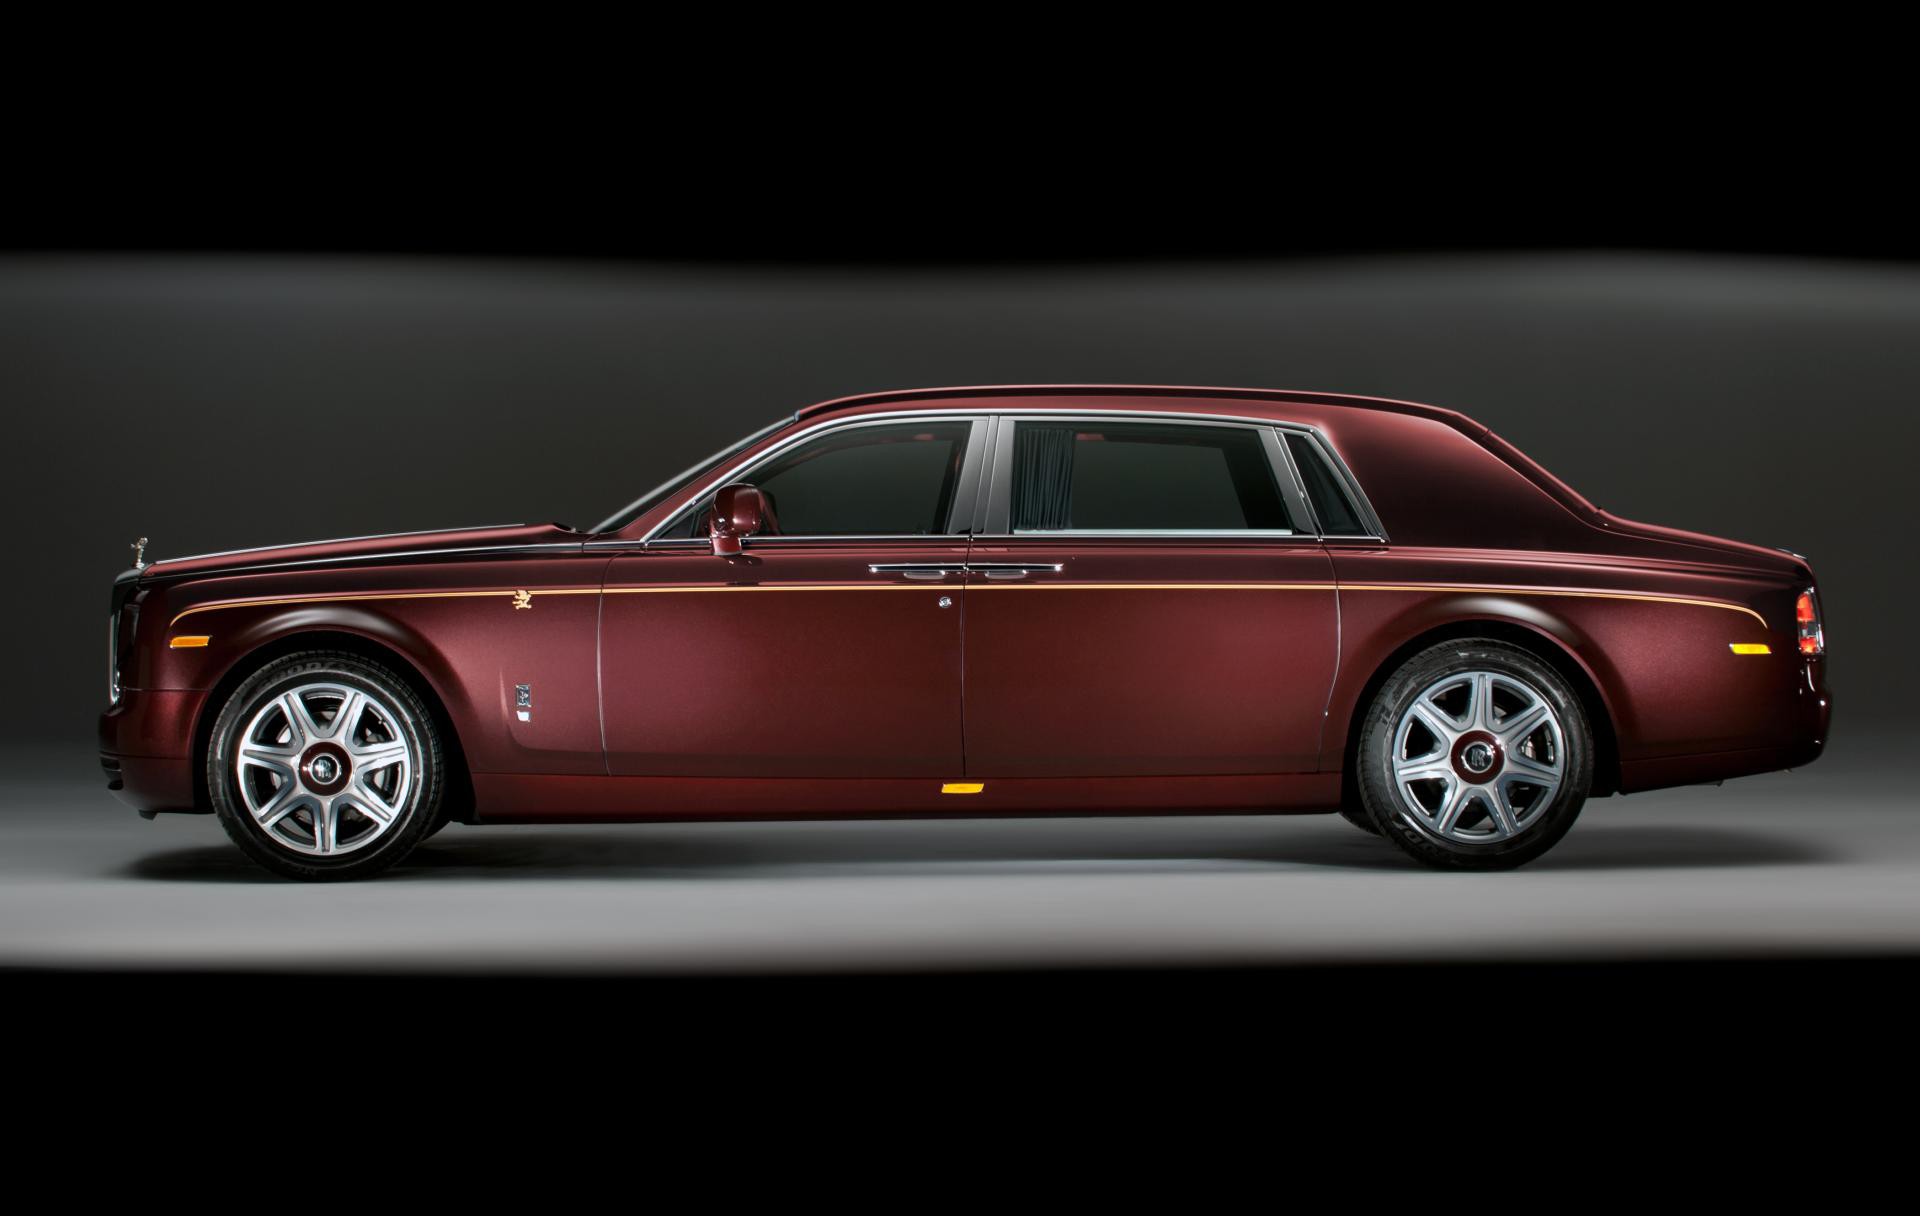 2012 Rolls-Royce Phantom Dragon Collection News and Information